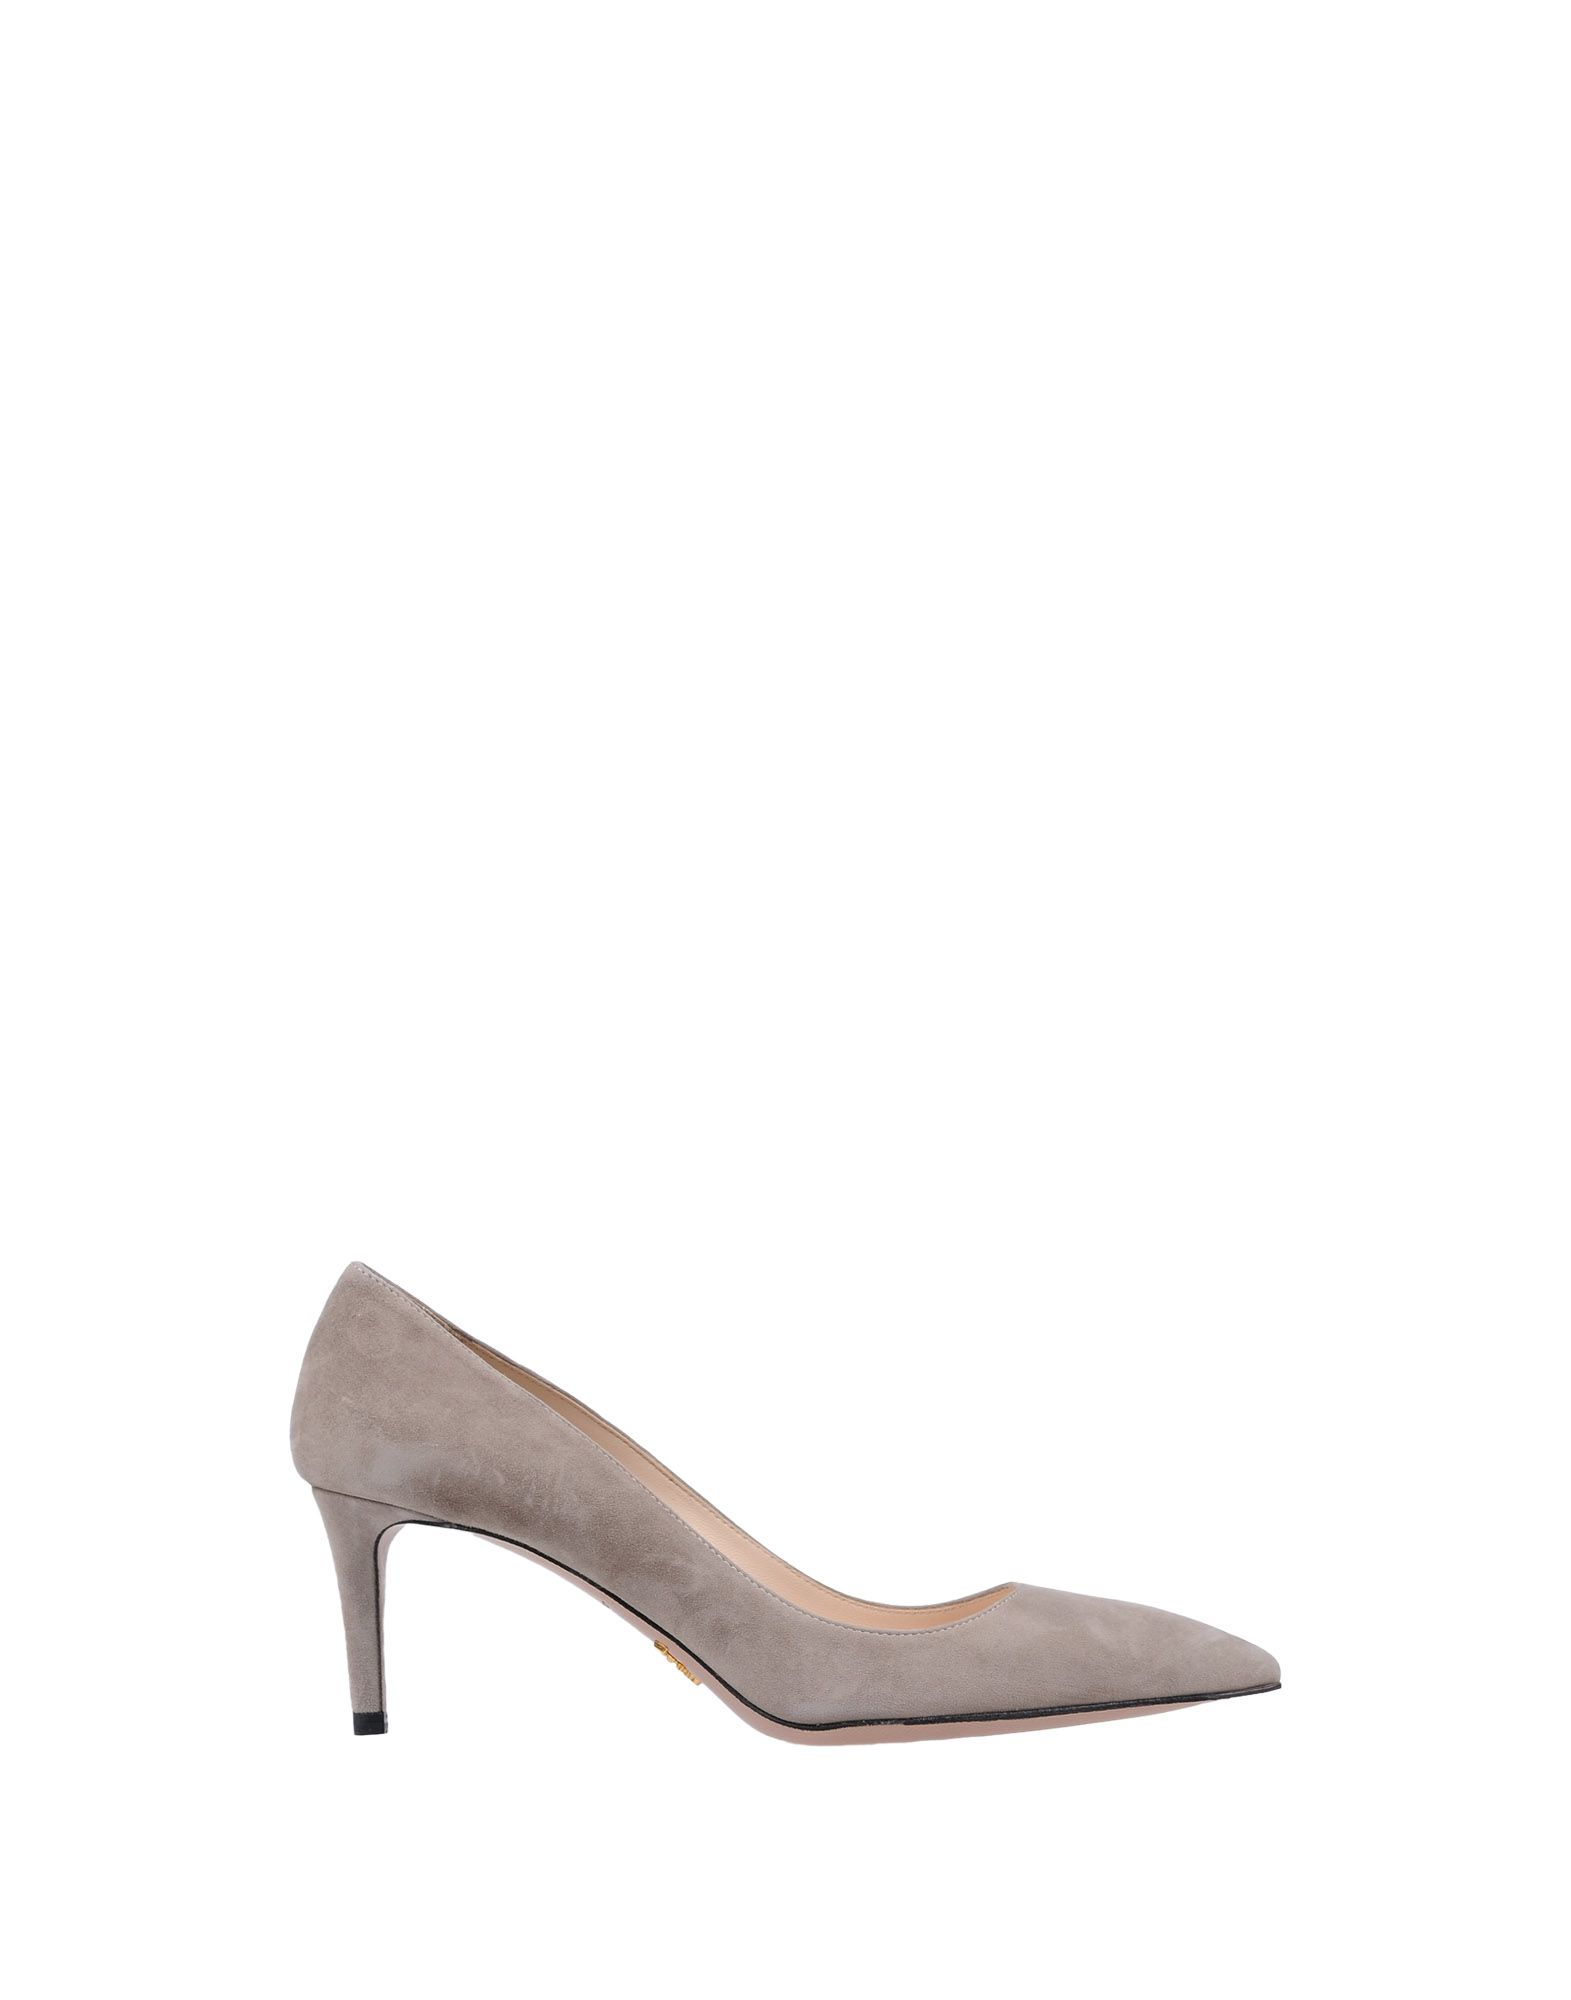 Schuhe Prada Pumps Damen  11519352GU Heiße Schuhe  57aa4d